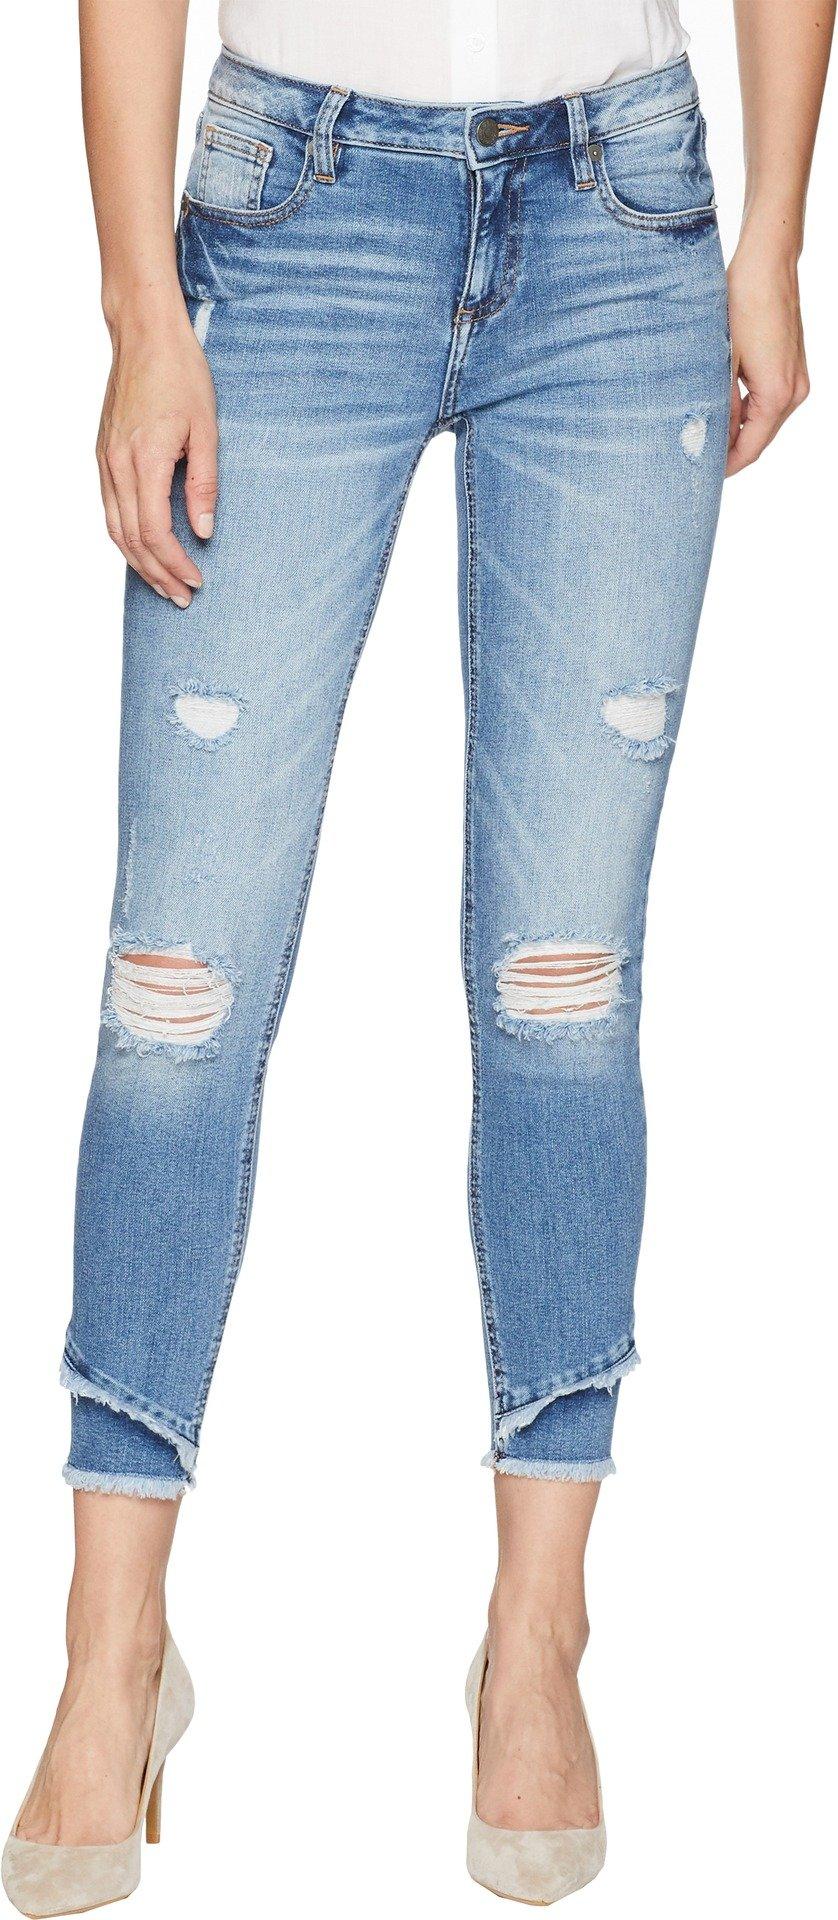 Miss Me Women's Mid-Rise Ankle Skinny Jeans in Denim Denim 28 27